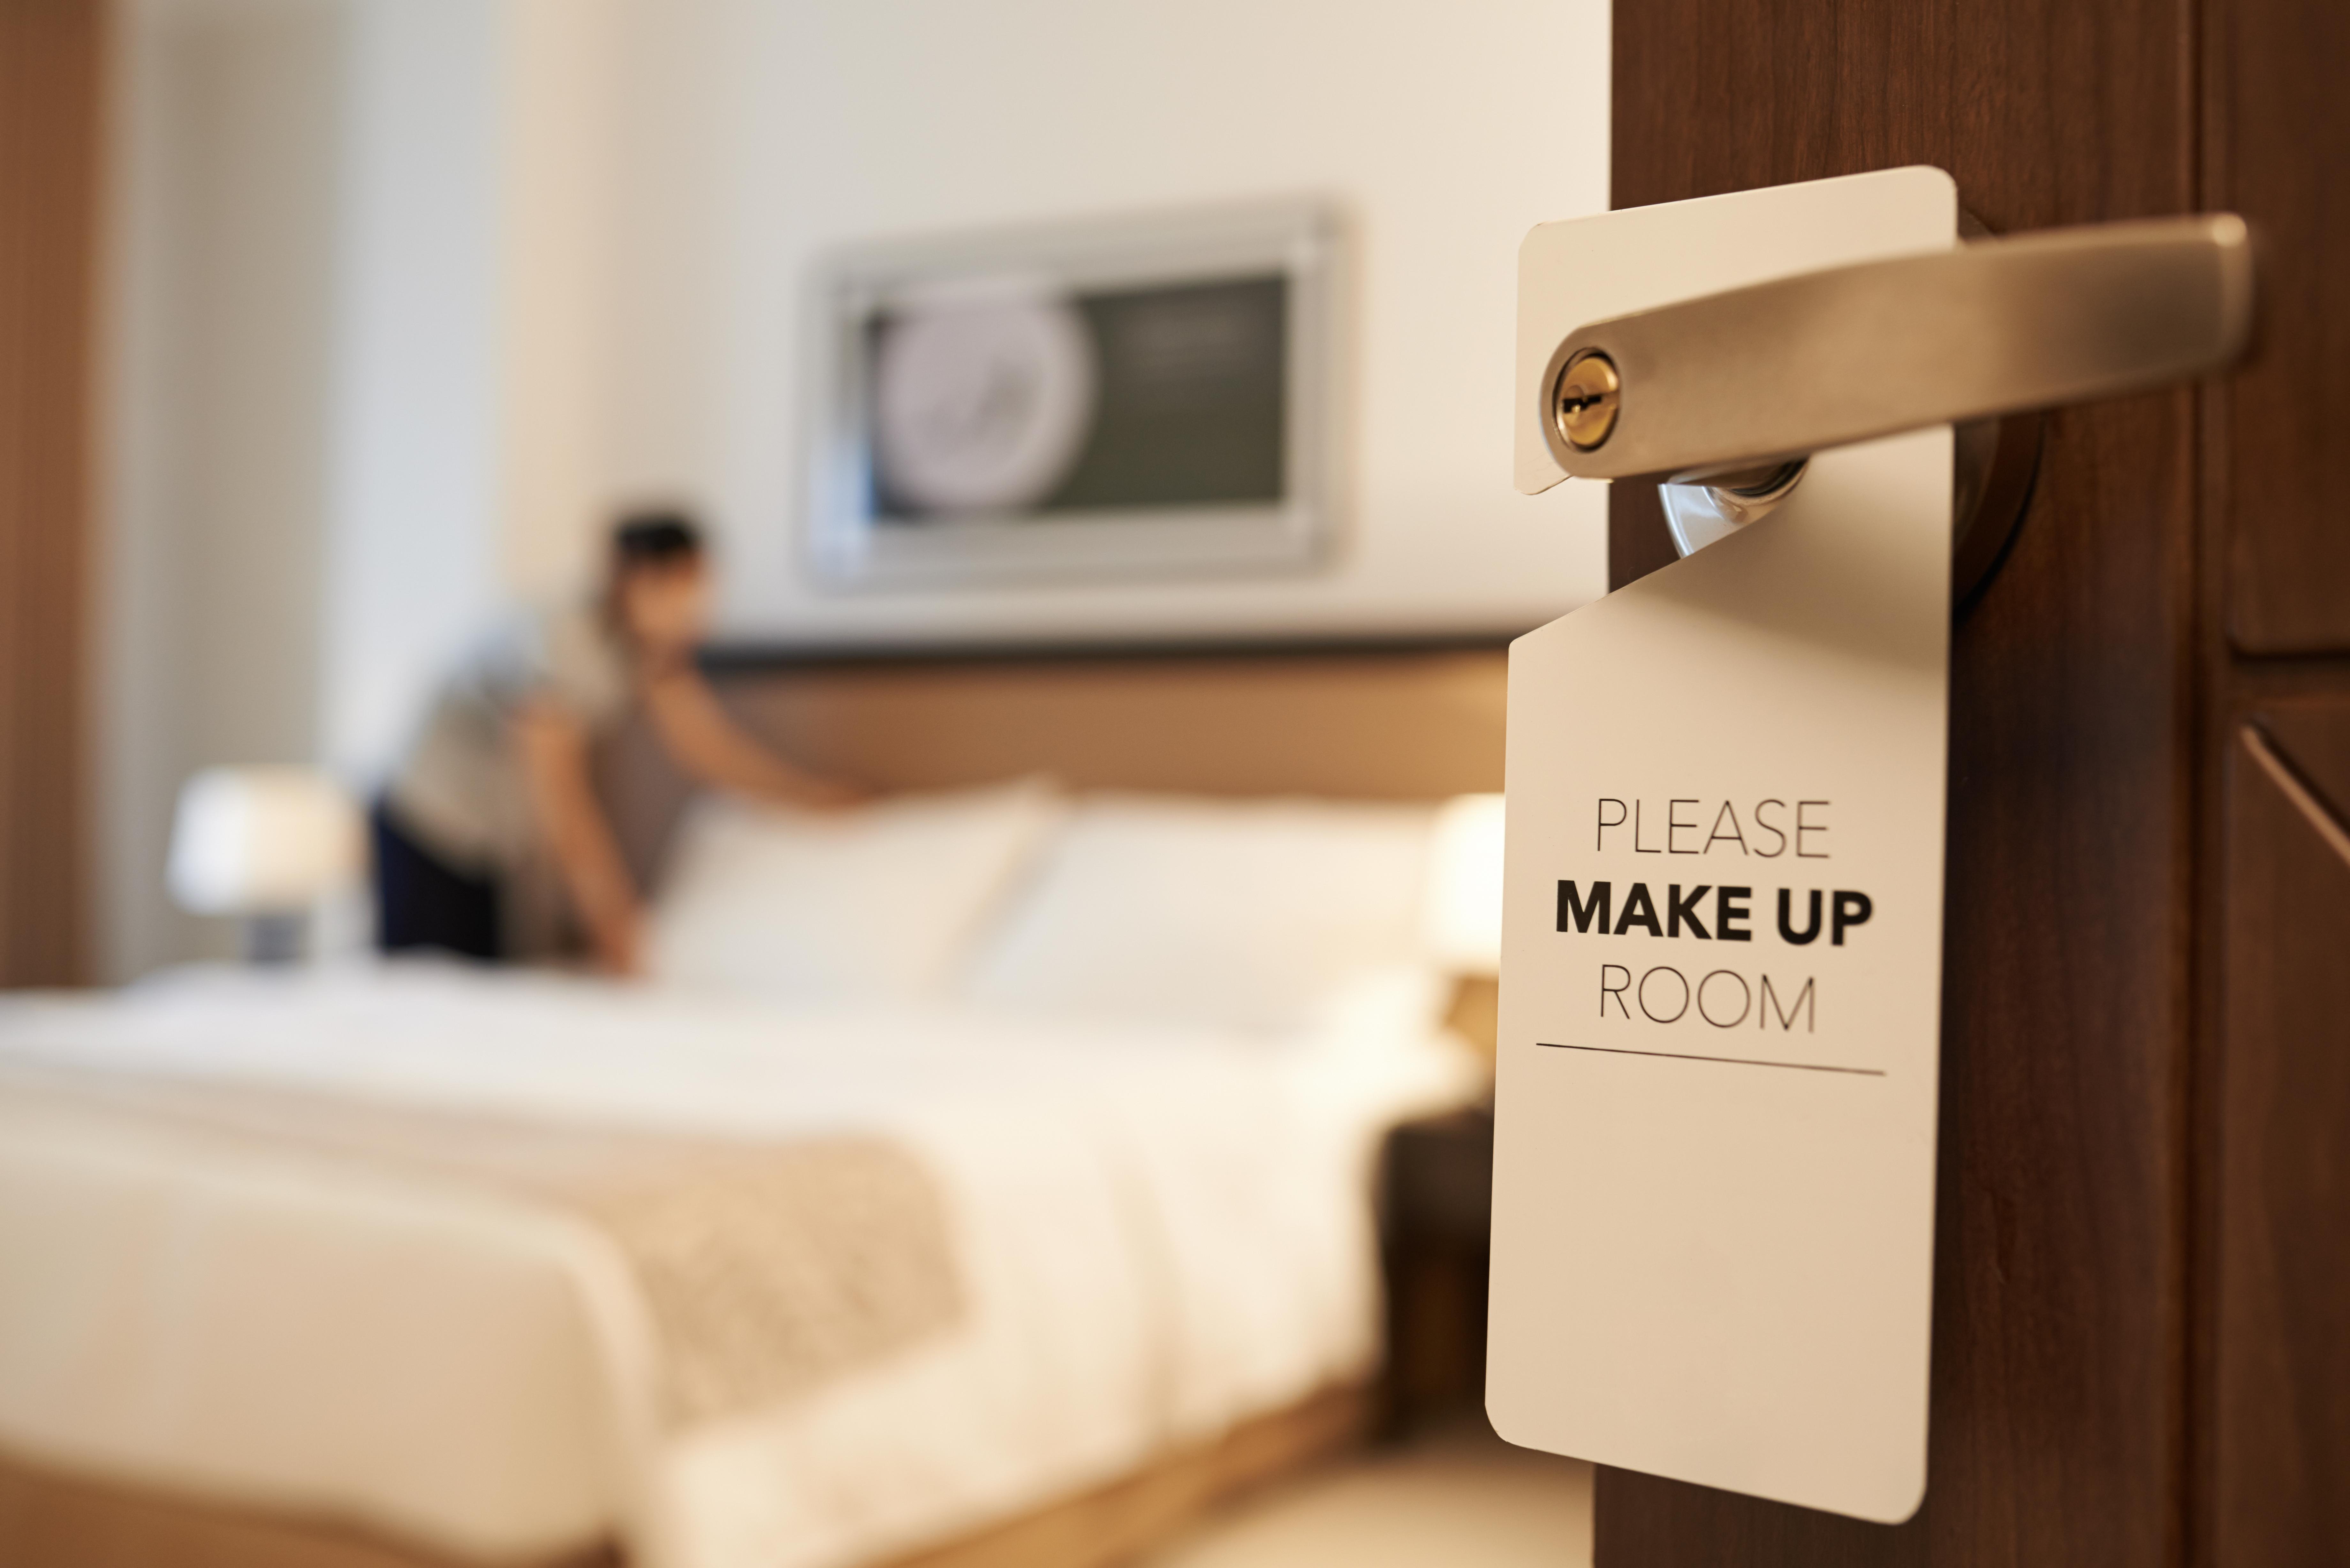 house keeping hotels ekenasfiber johnhenriksson se u2022 rh ekenasfiber johnhenriksson se